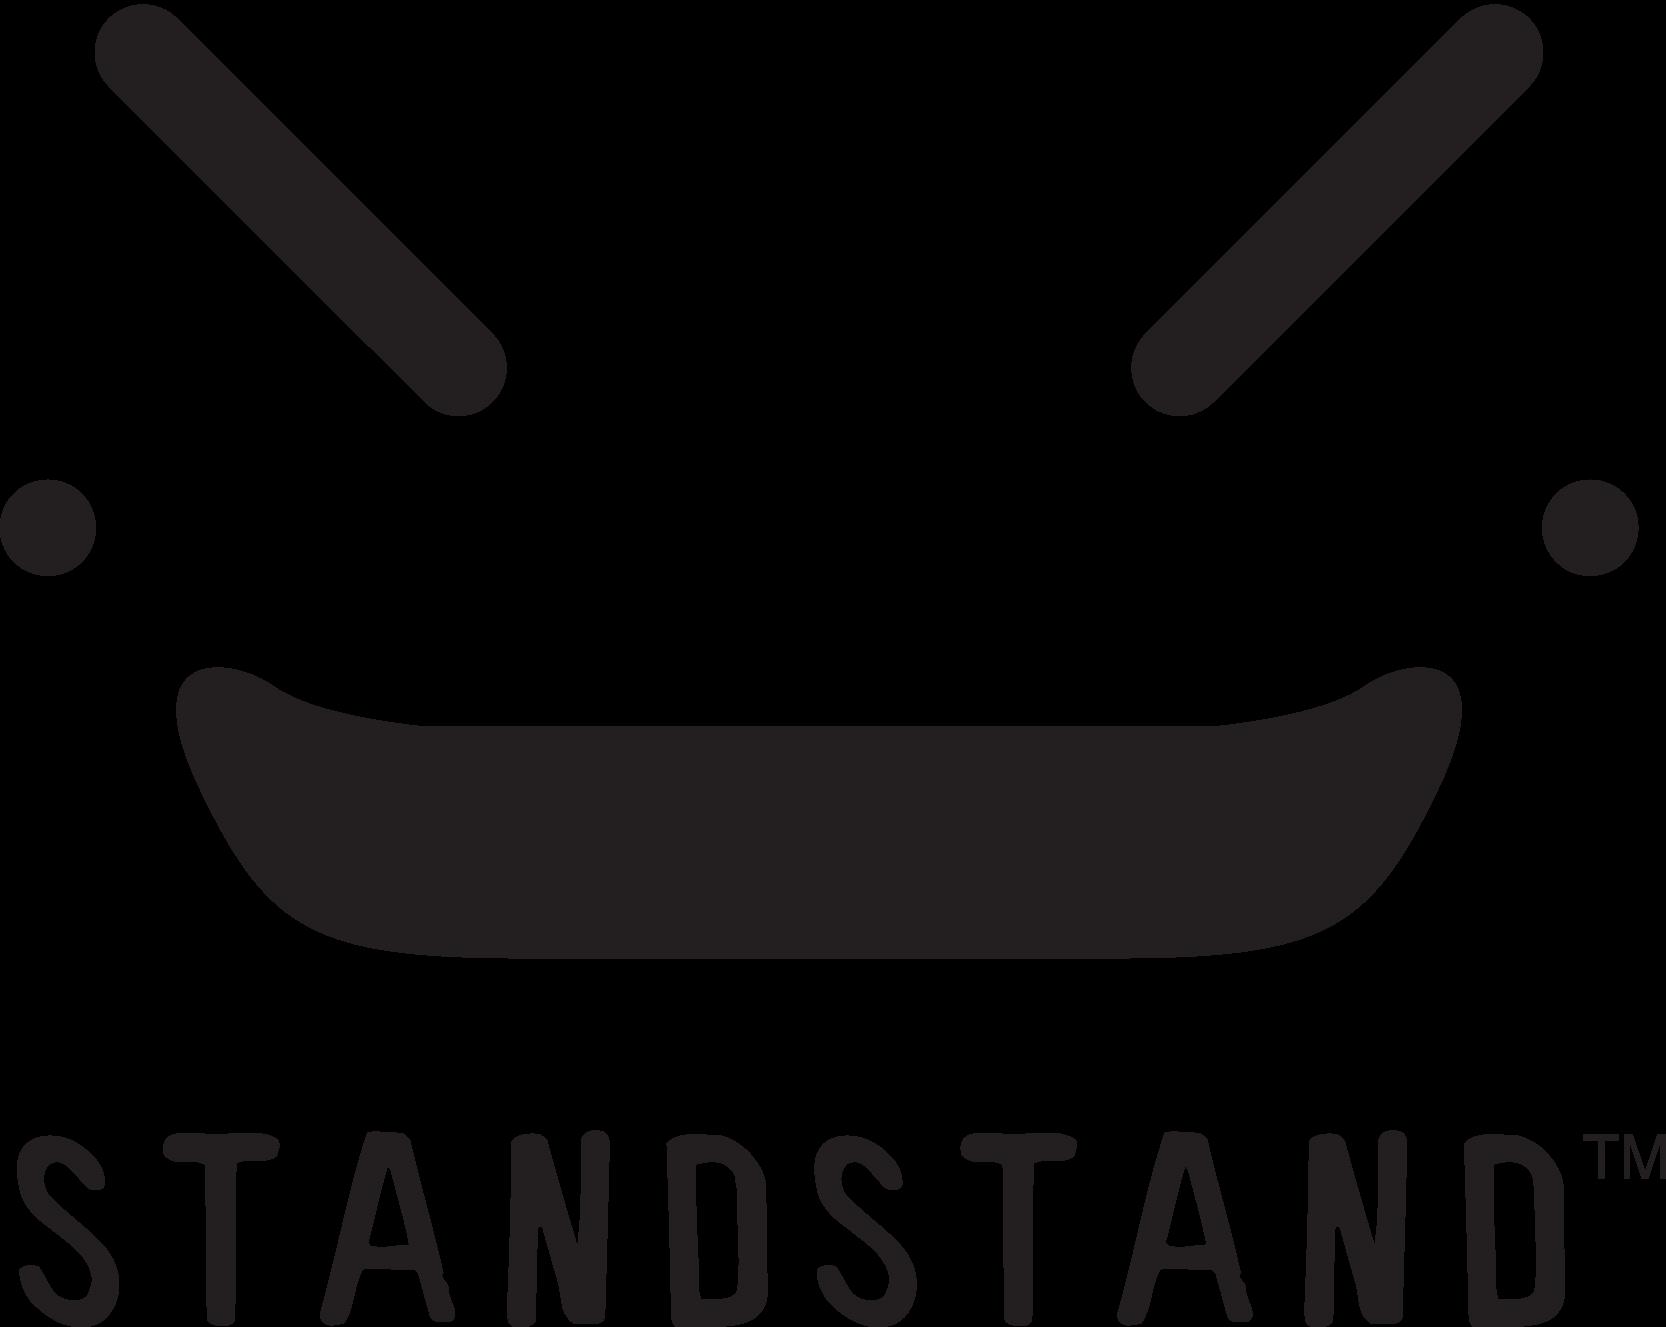 STANDSTAND-Logos-Black